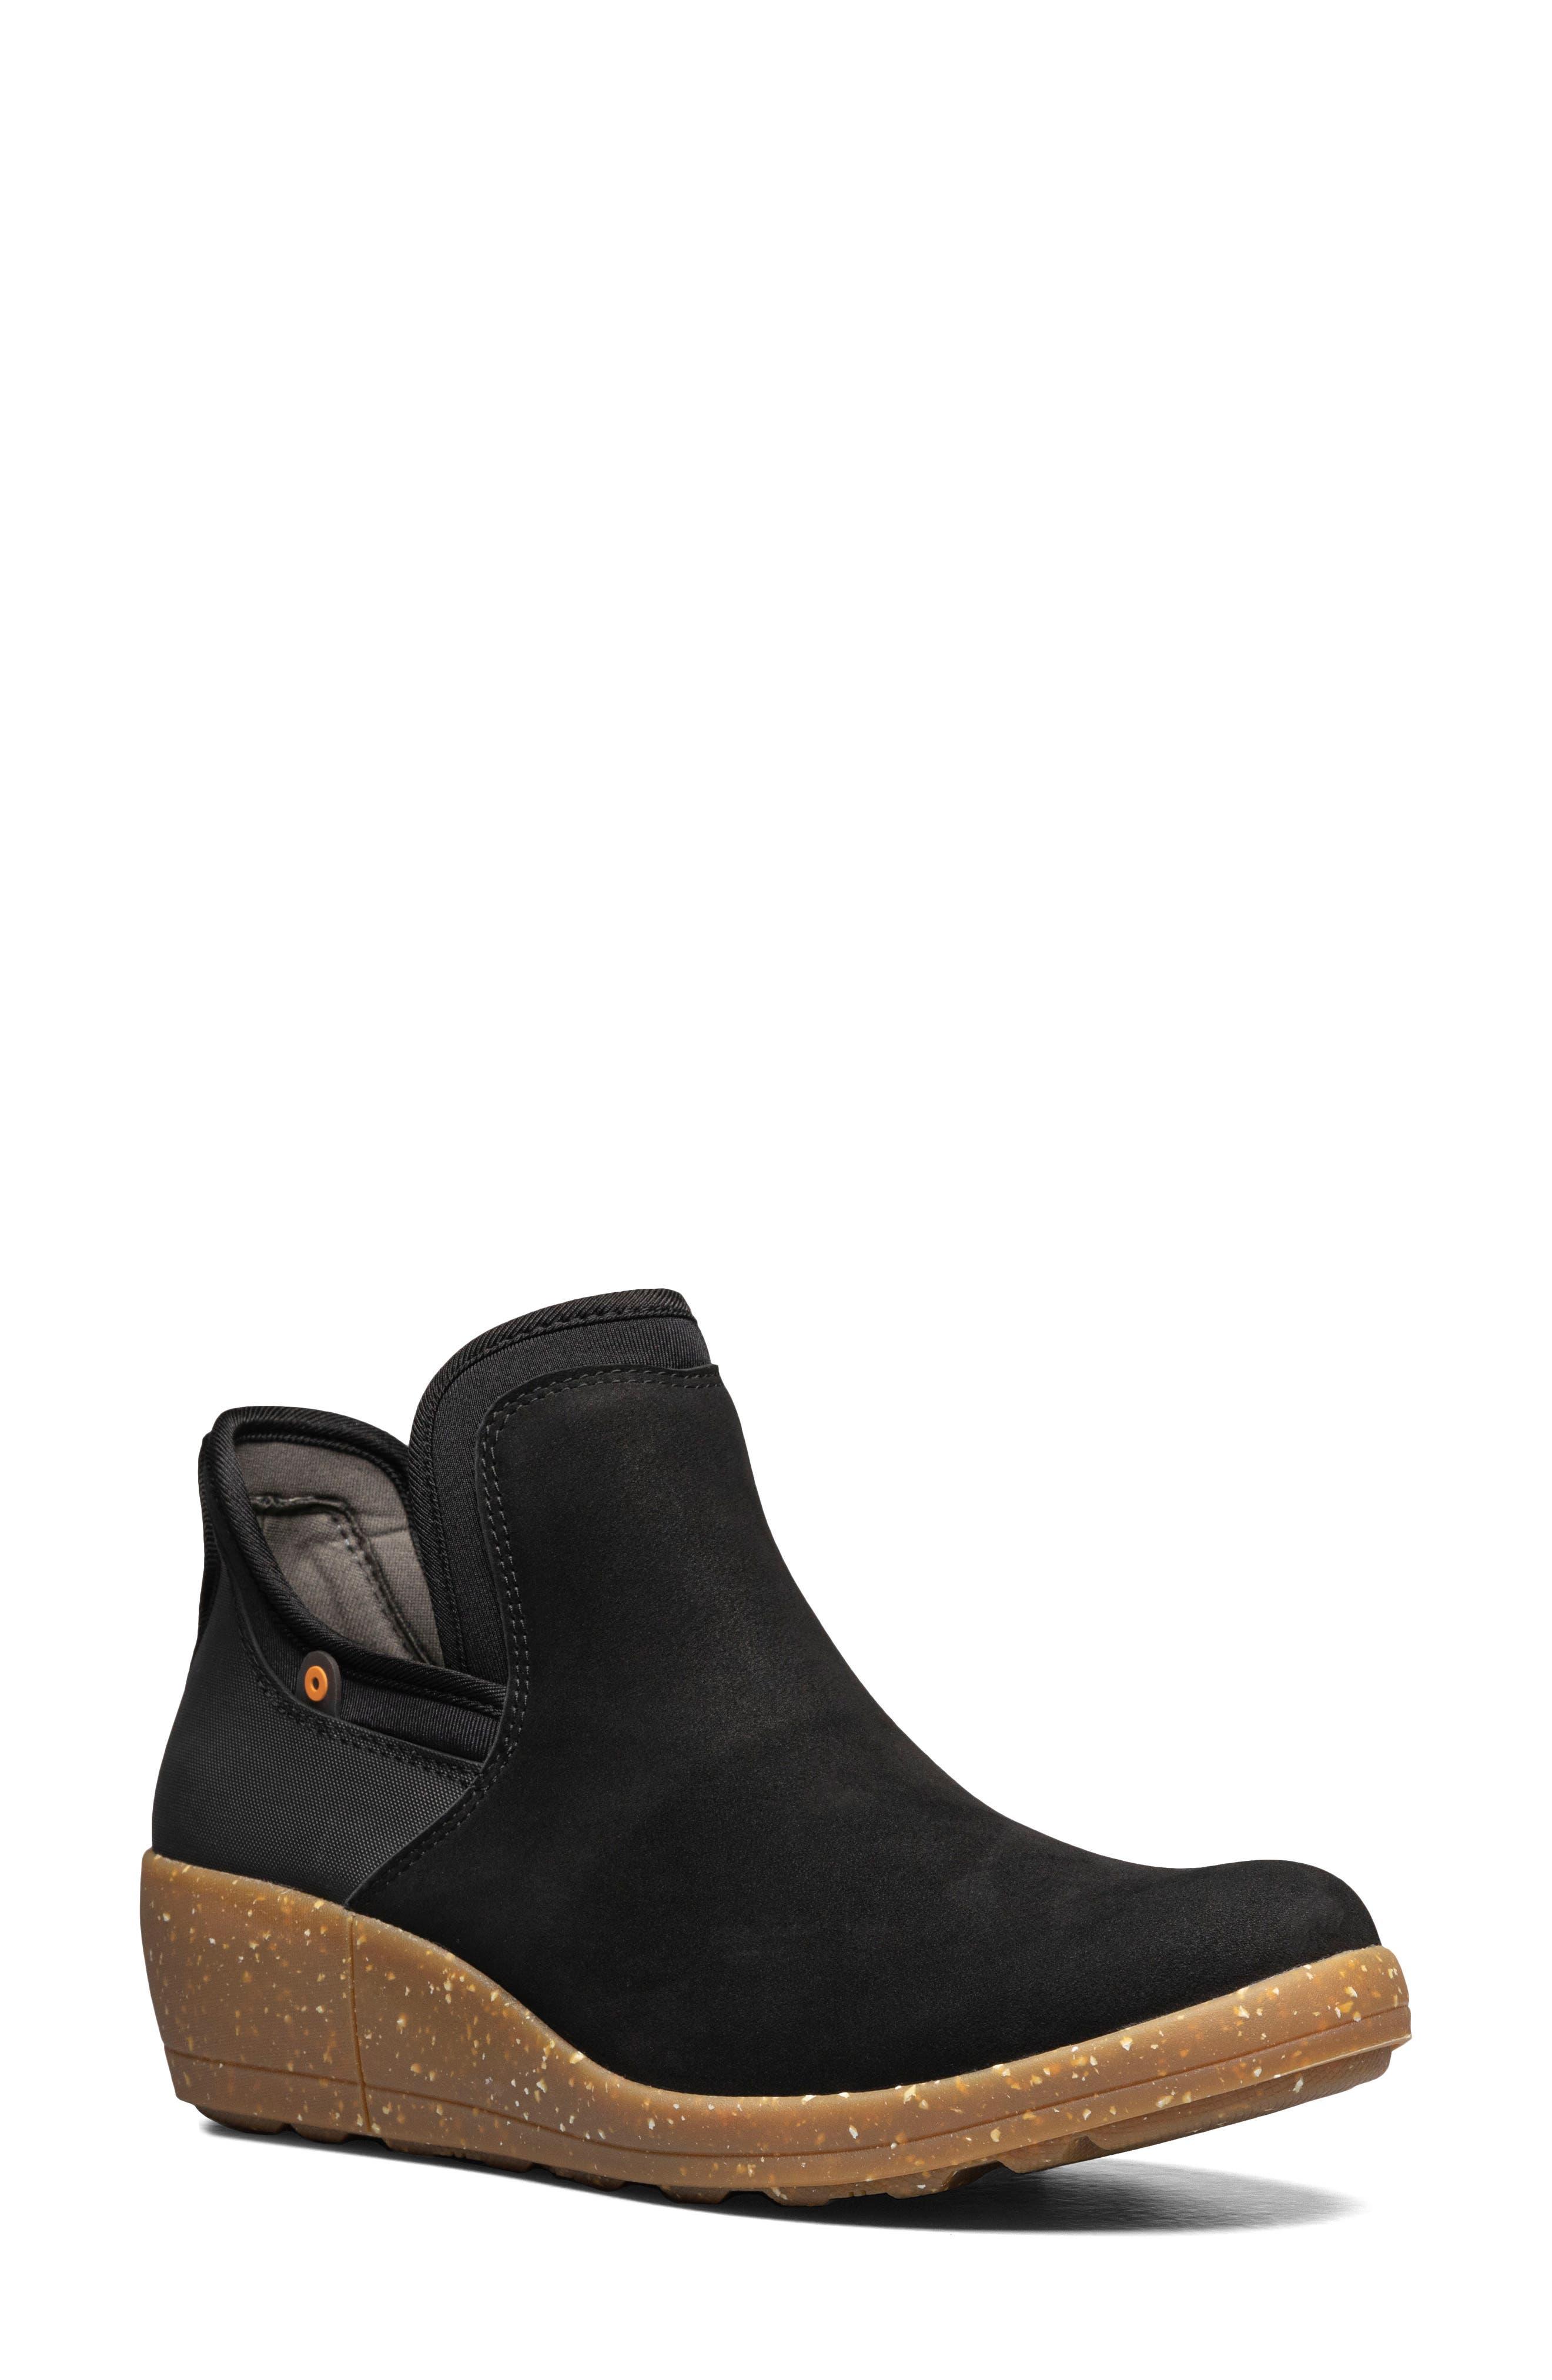 Vista Waterproof Wedge Rain Boot